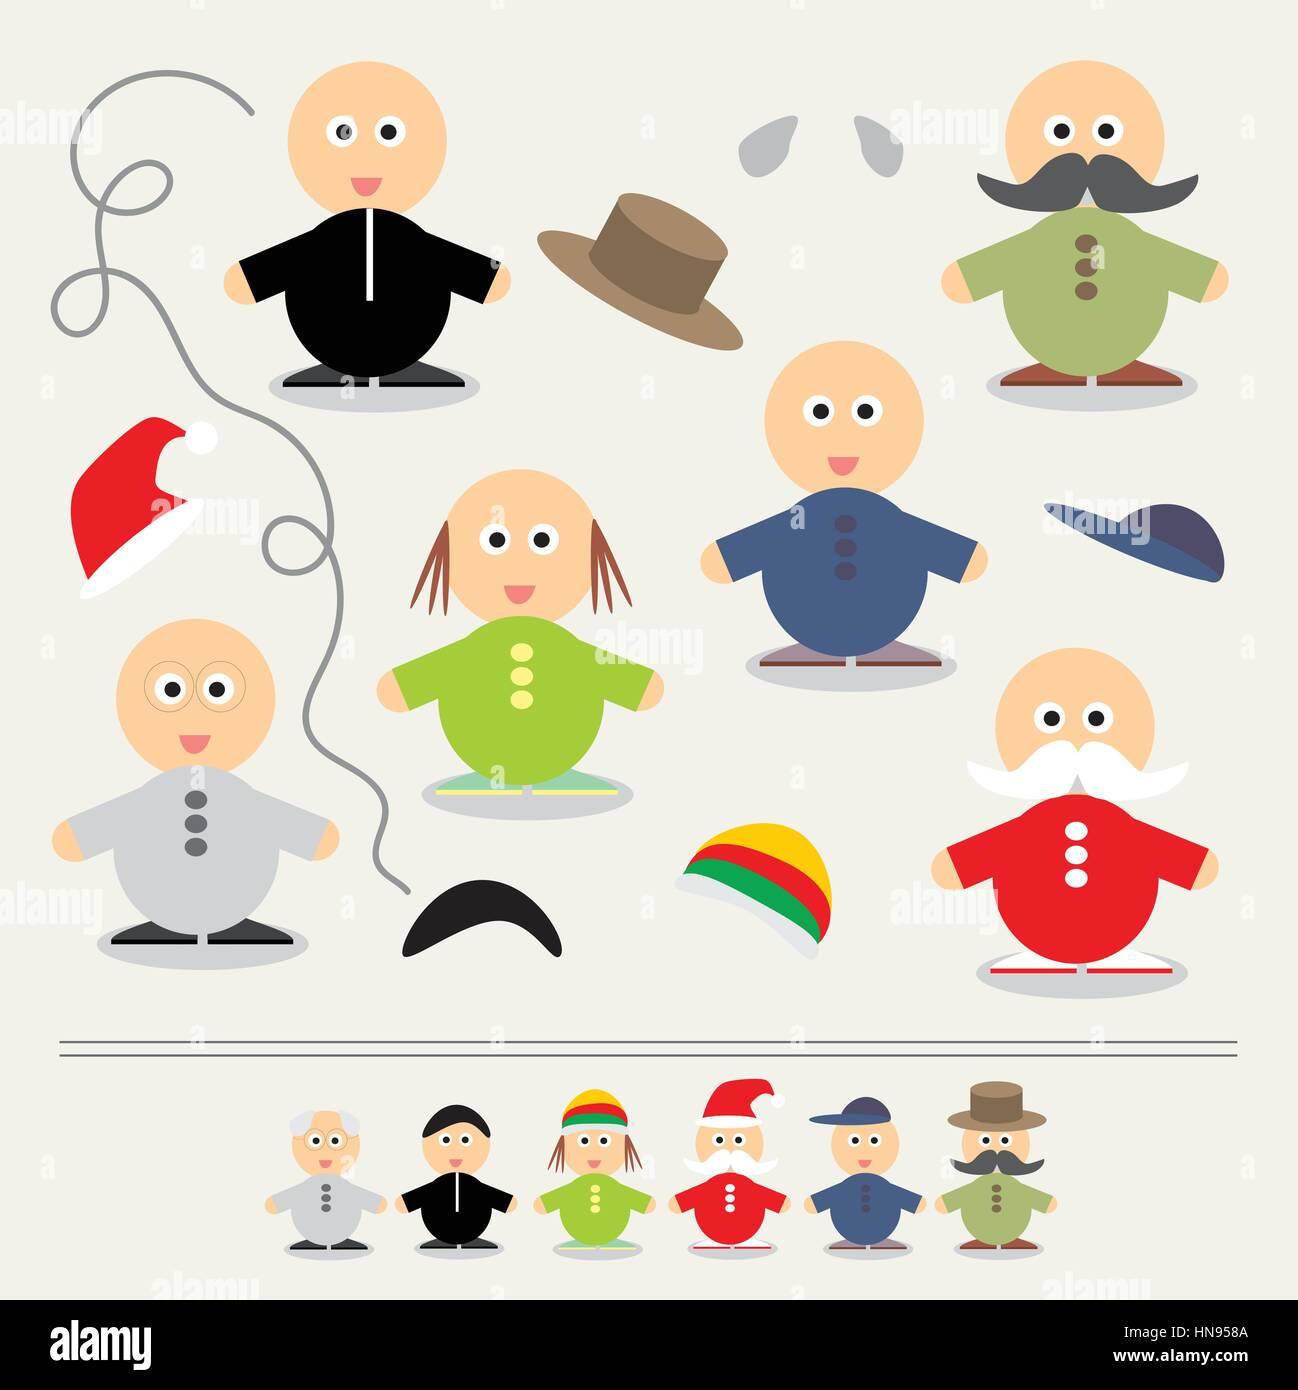 educational game for children color vector illustration stock